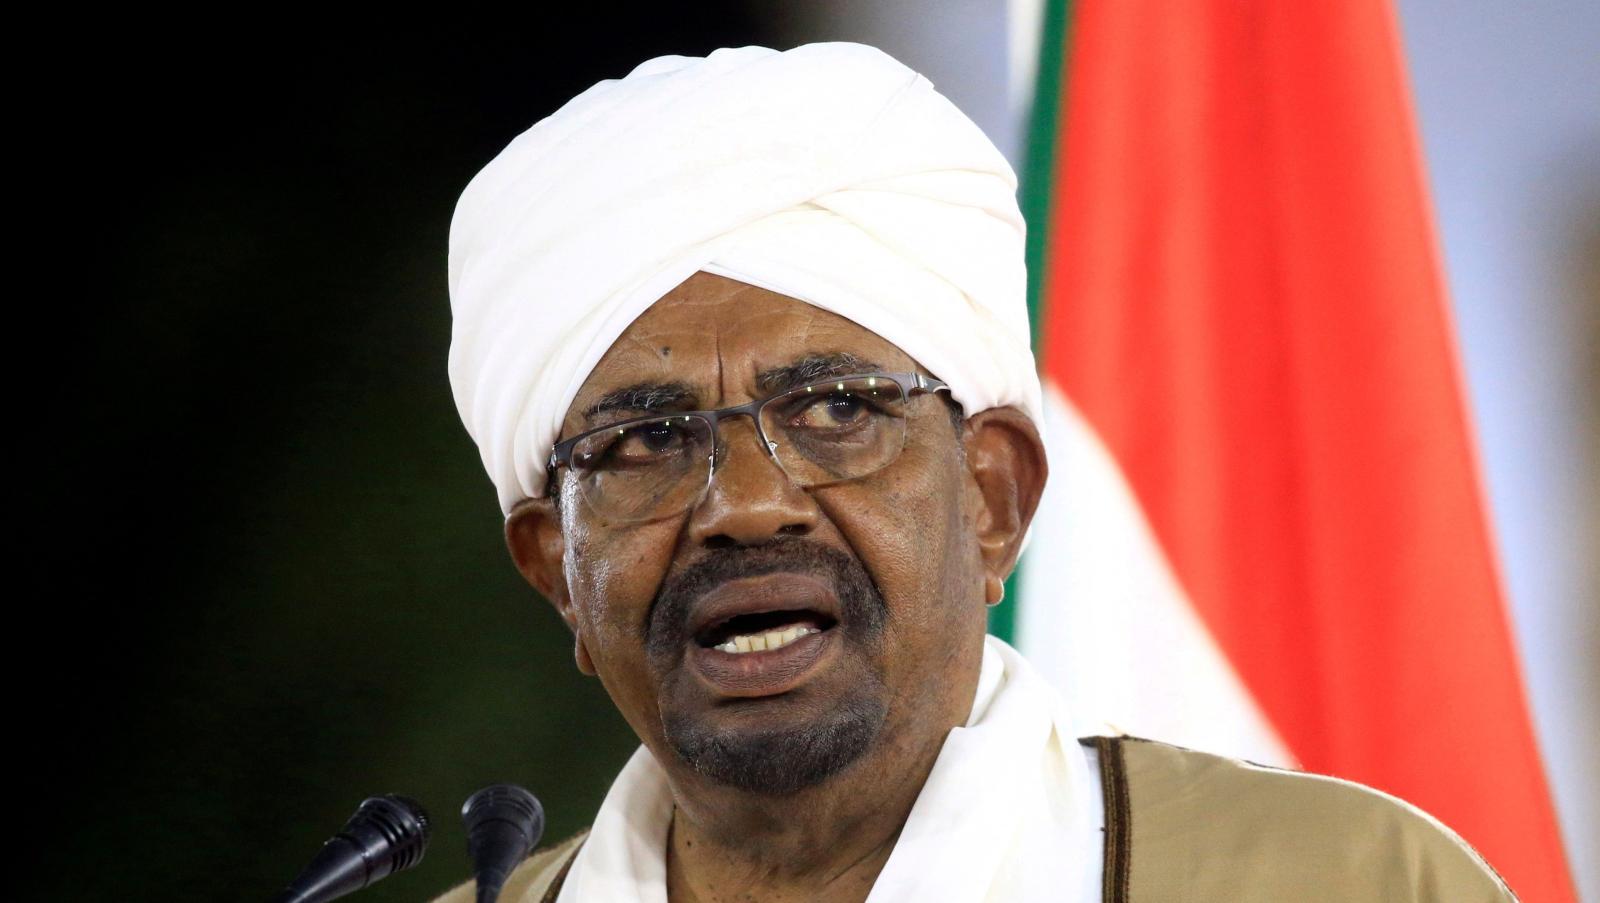 Sudan's ousted president Omar al-Bashir